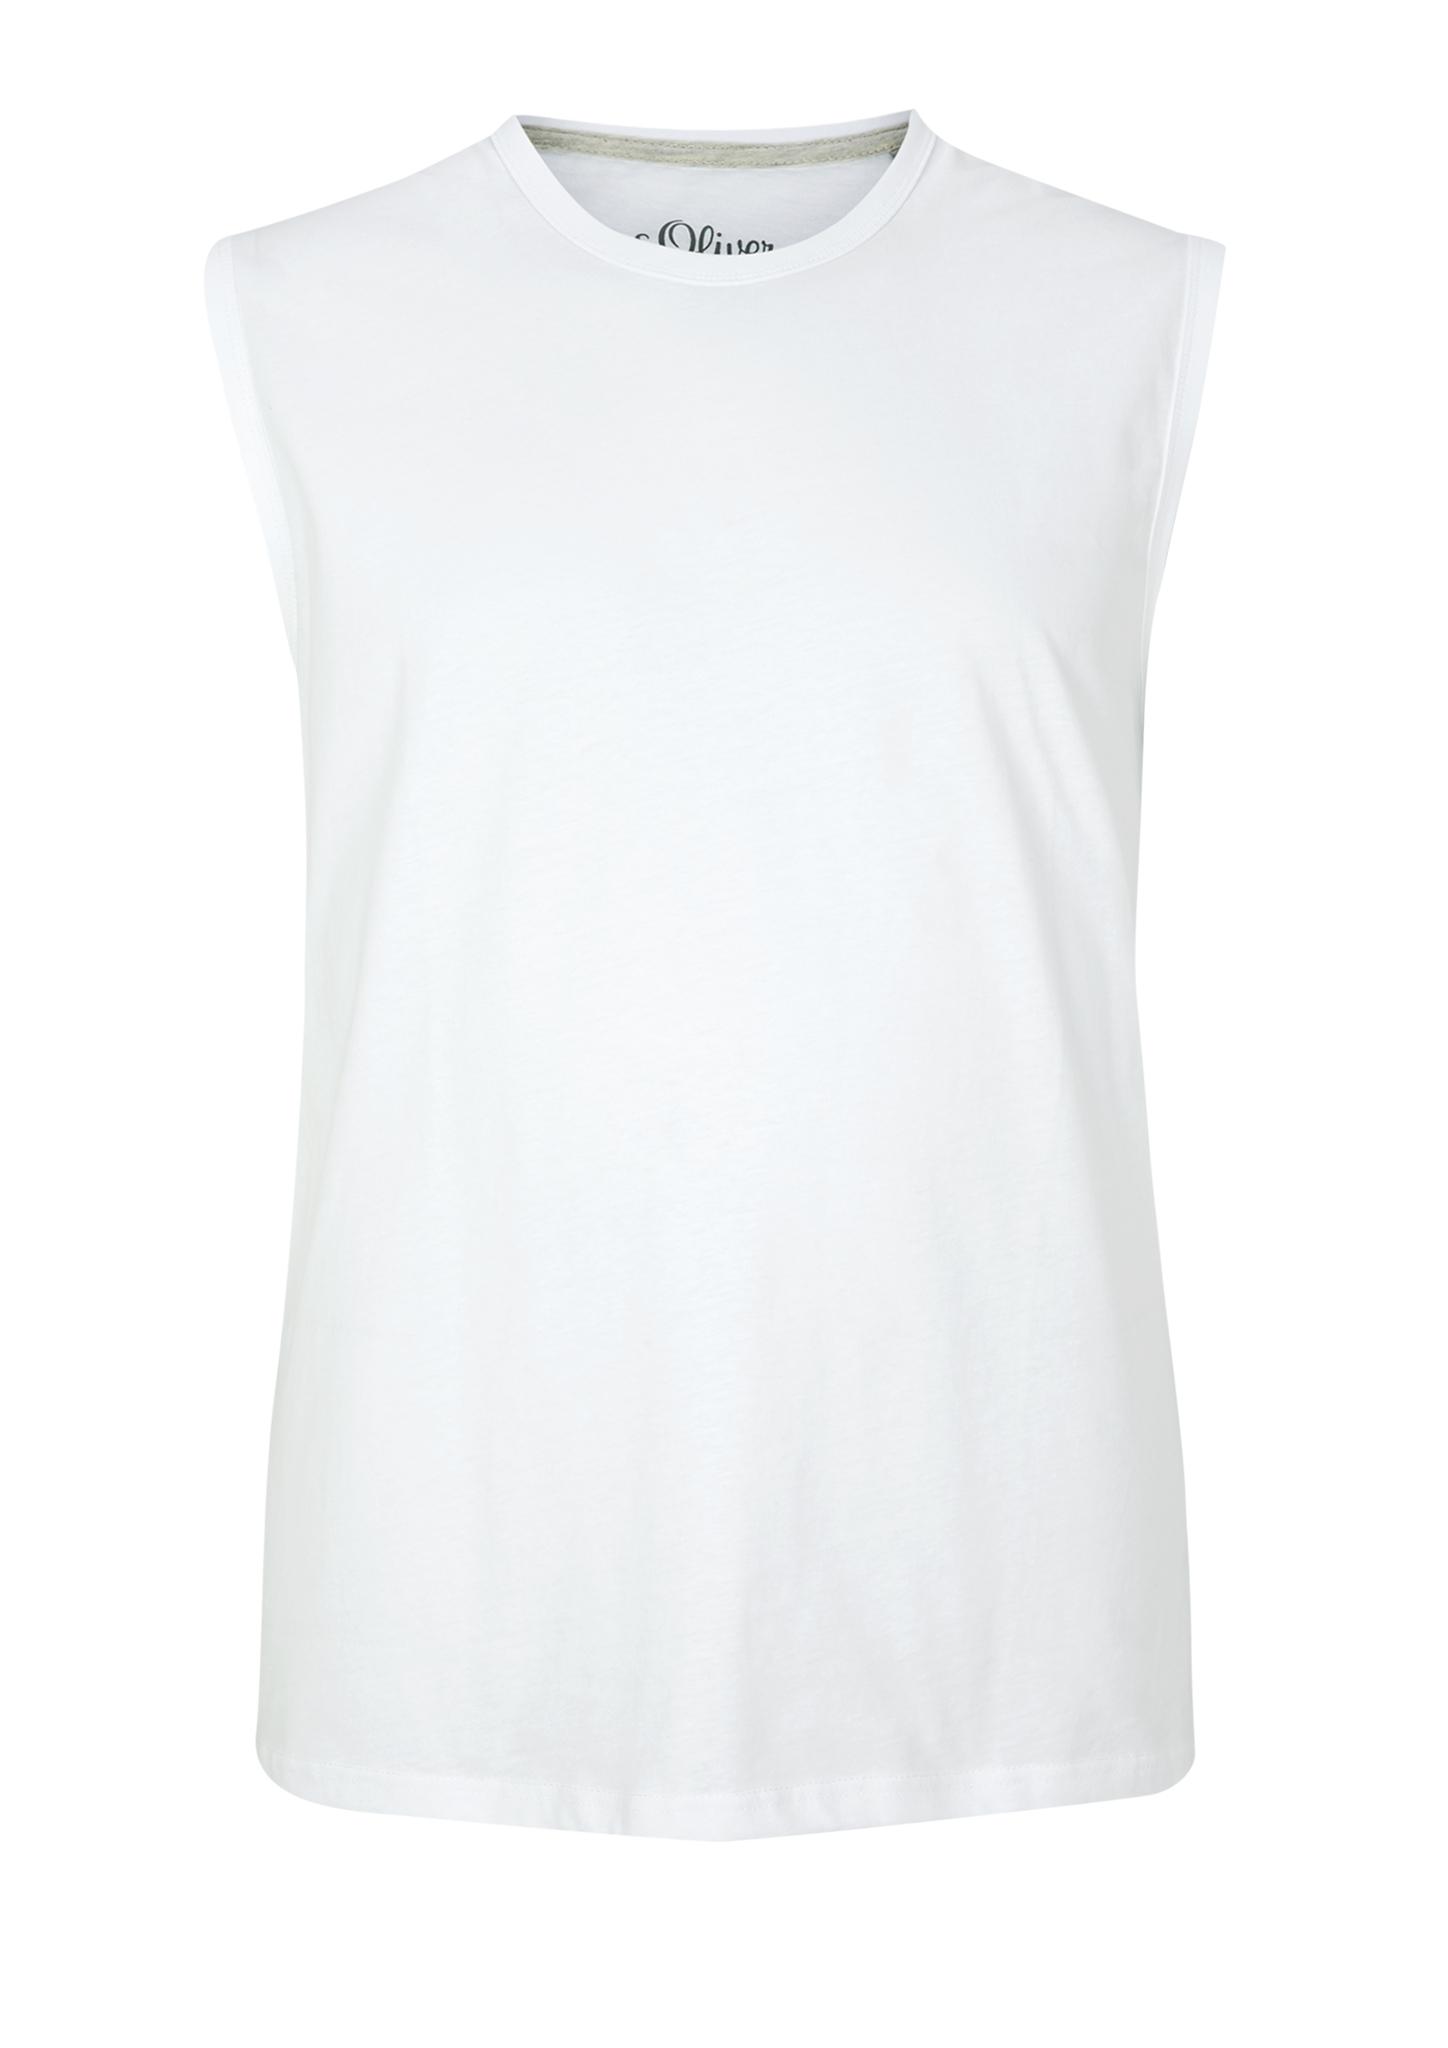 Tanktop   Sportbekleidung > Tanktops   Weiß   100% baumwolle   s.Oliver Men Big Sizes